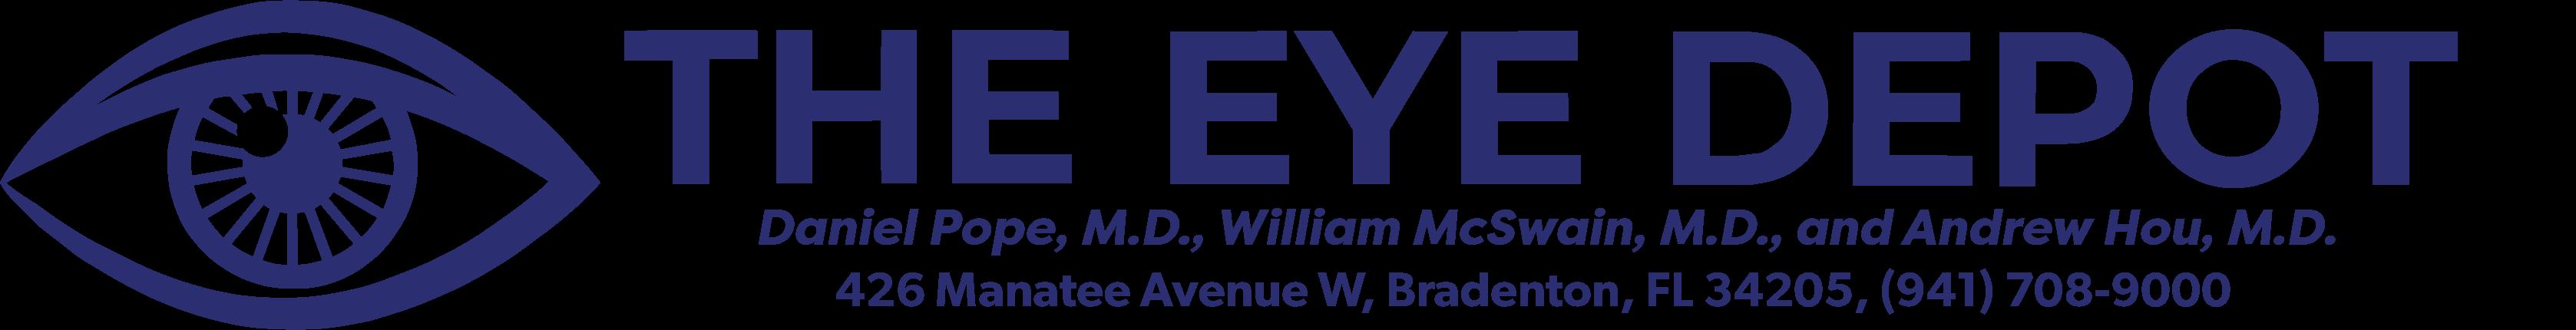 The Eye Depot Logo